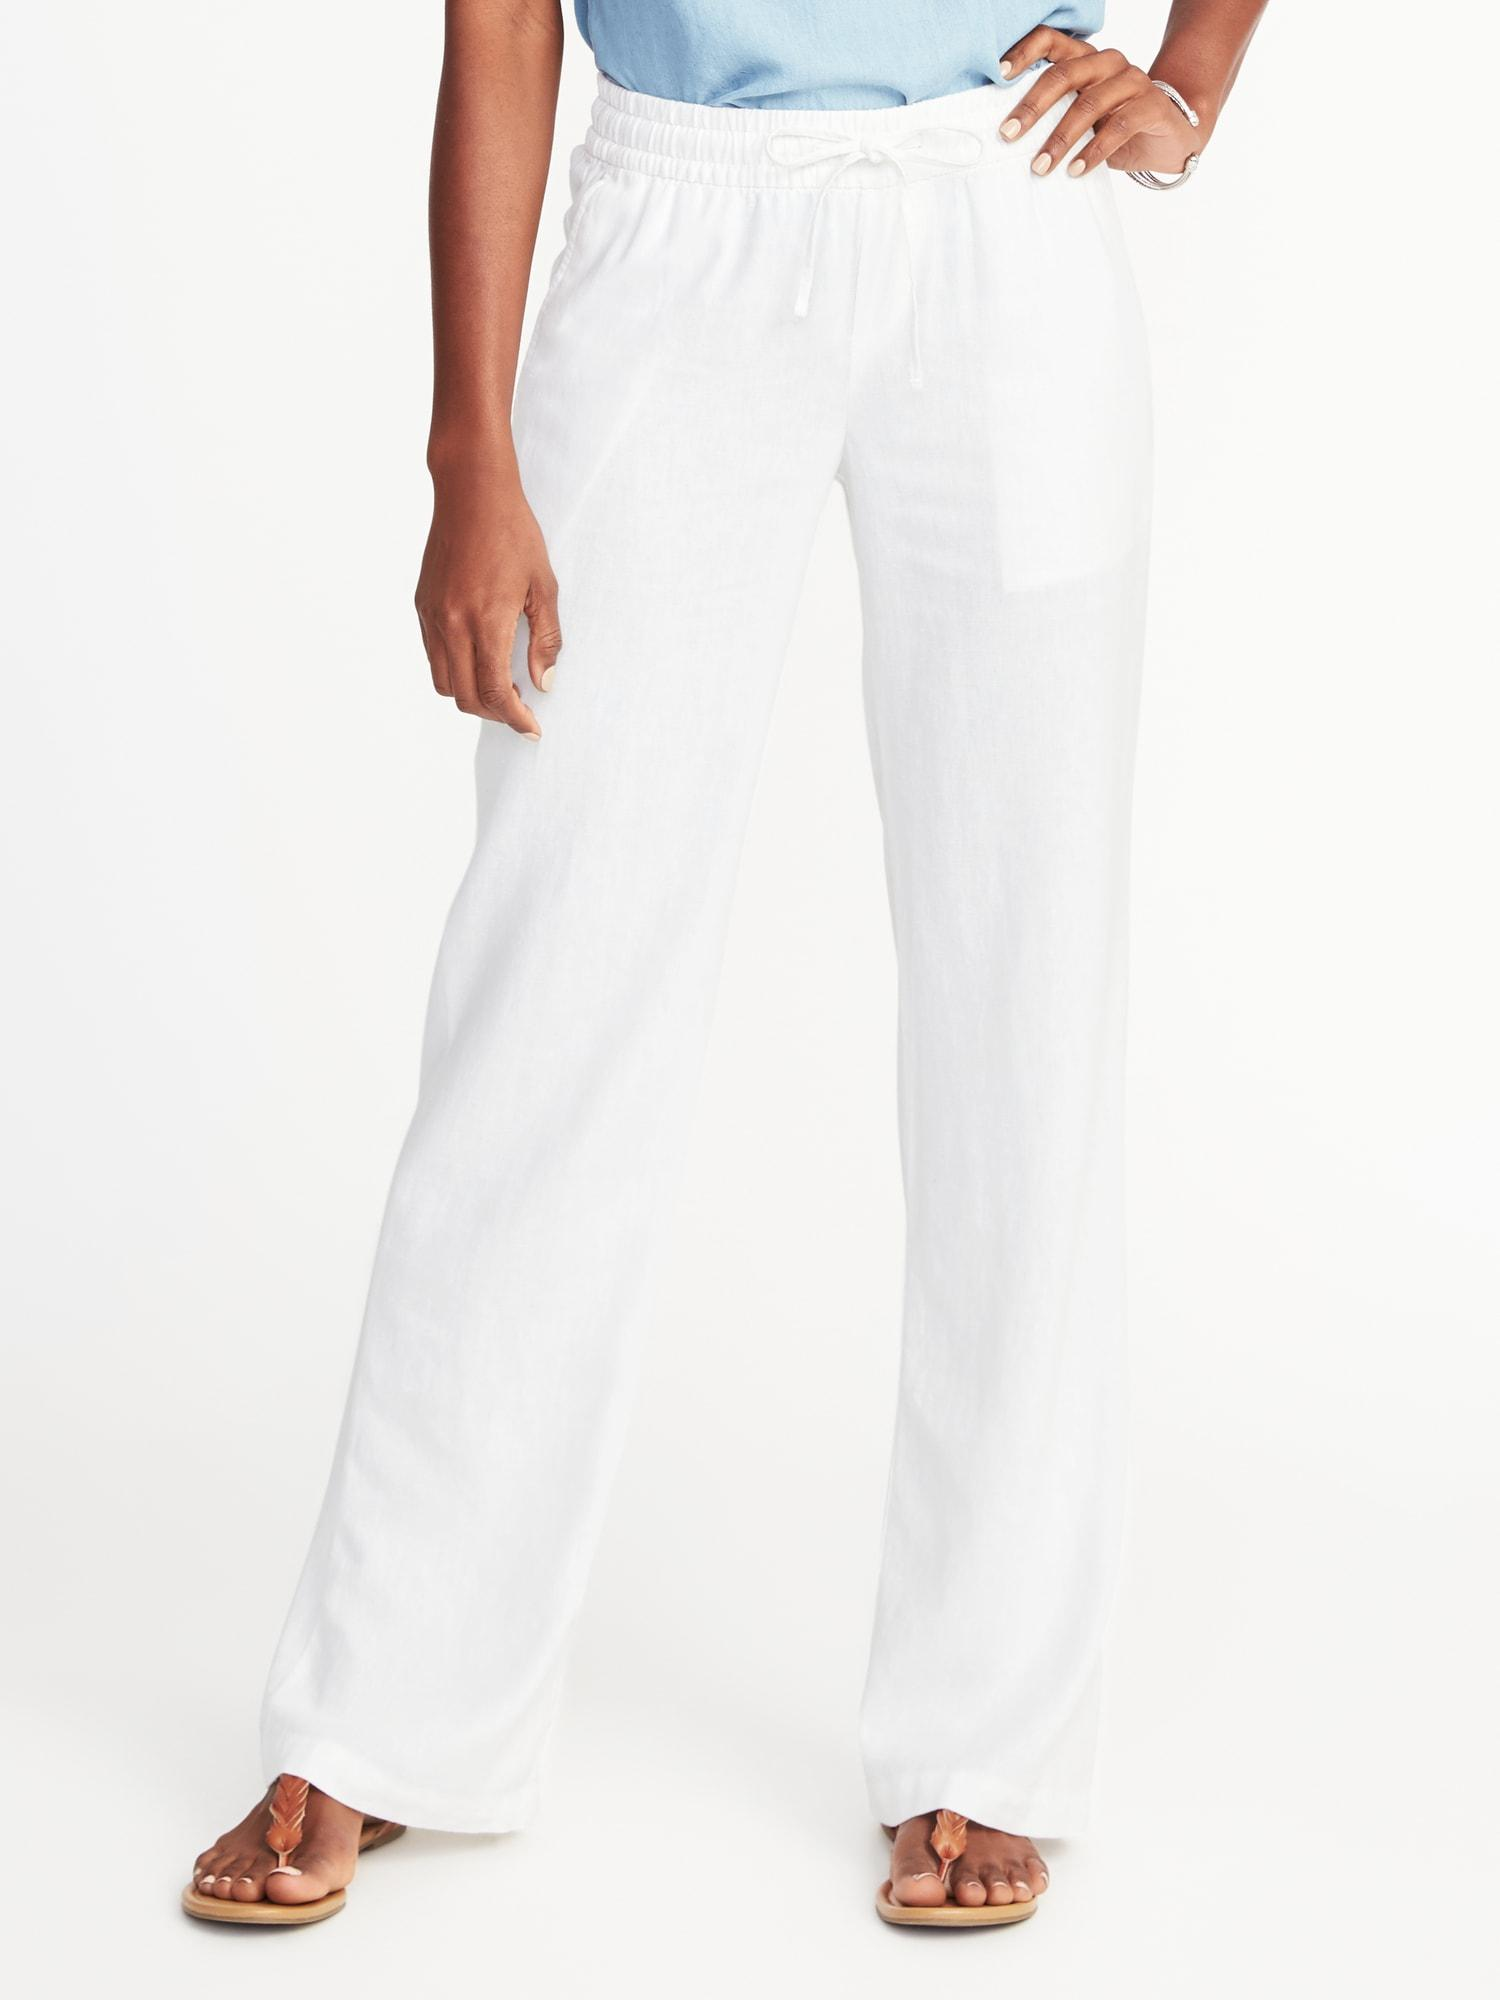 bbf6b55b5807e Lyst - Old Navy Mid-rise Soft Wide-leg Linen-blend Pants in White